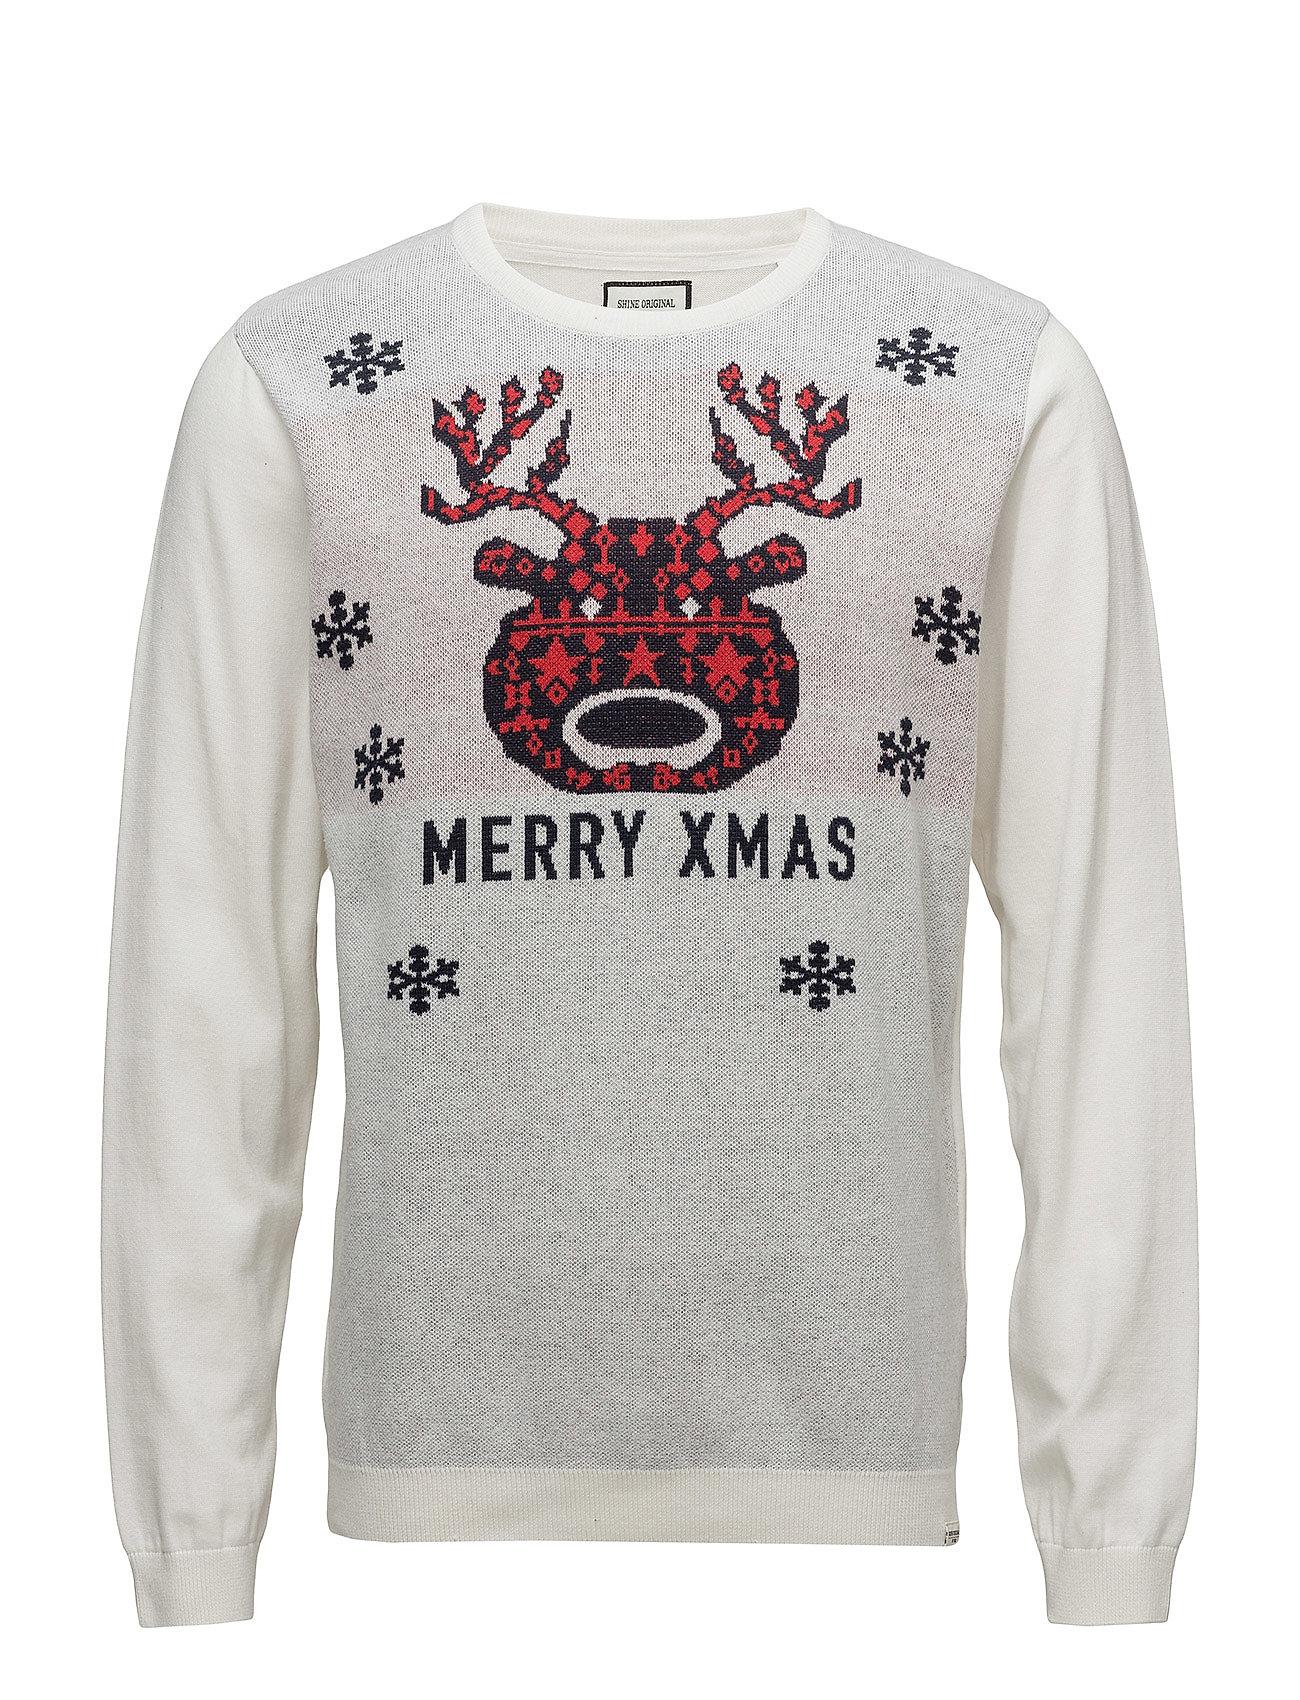 Shine Original Jacquard merry xmas knit